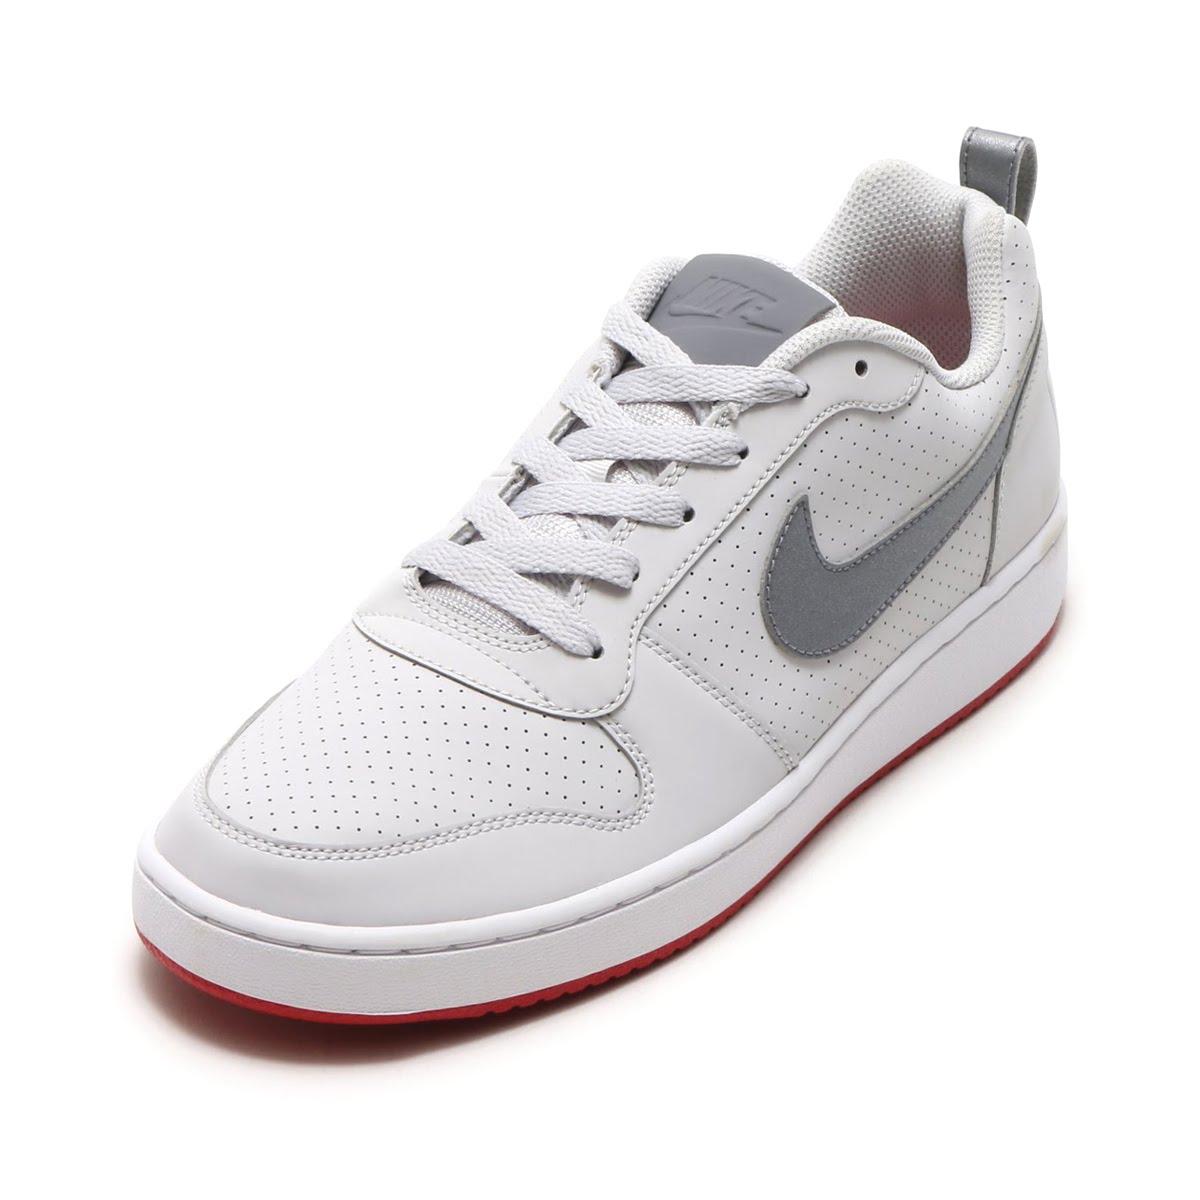 7bde45149055 atmos pink  NIKE COURT BOROUGH LOW SL (Nike coat Barlow low SL) VAST ...